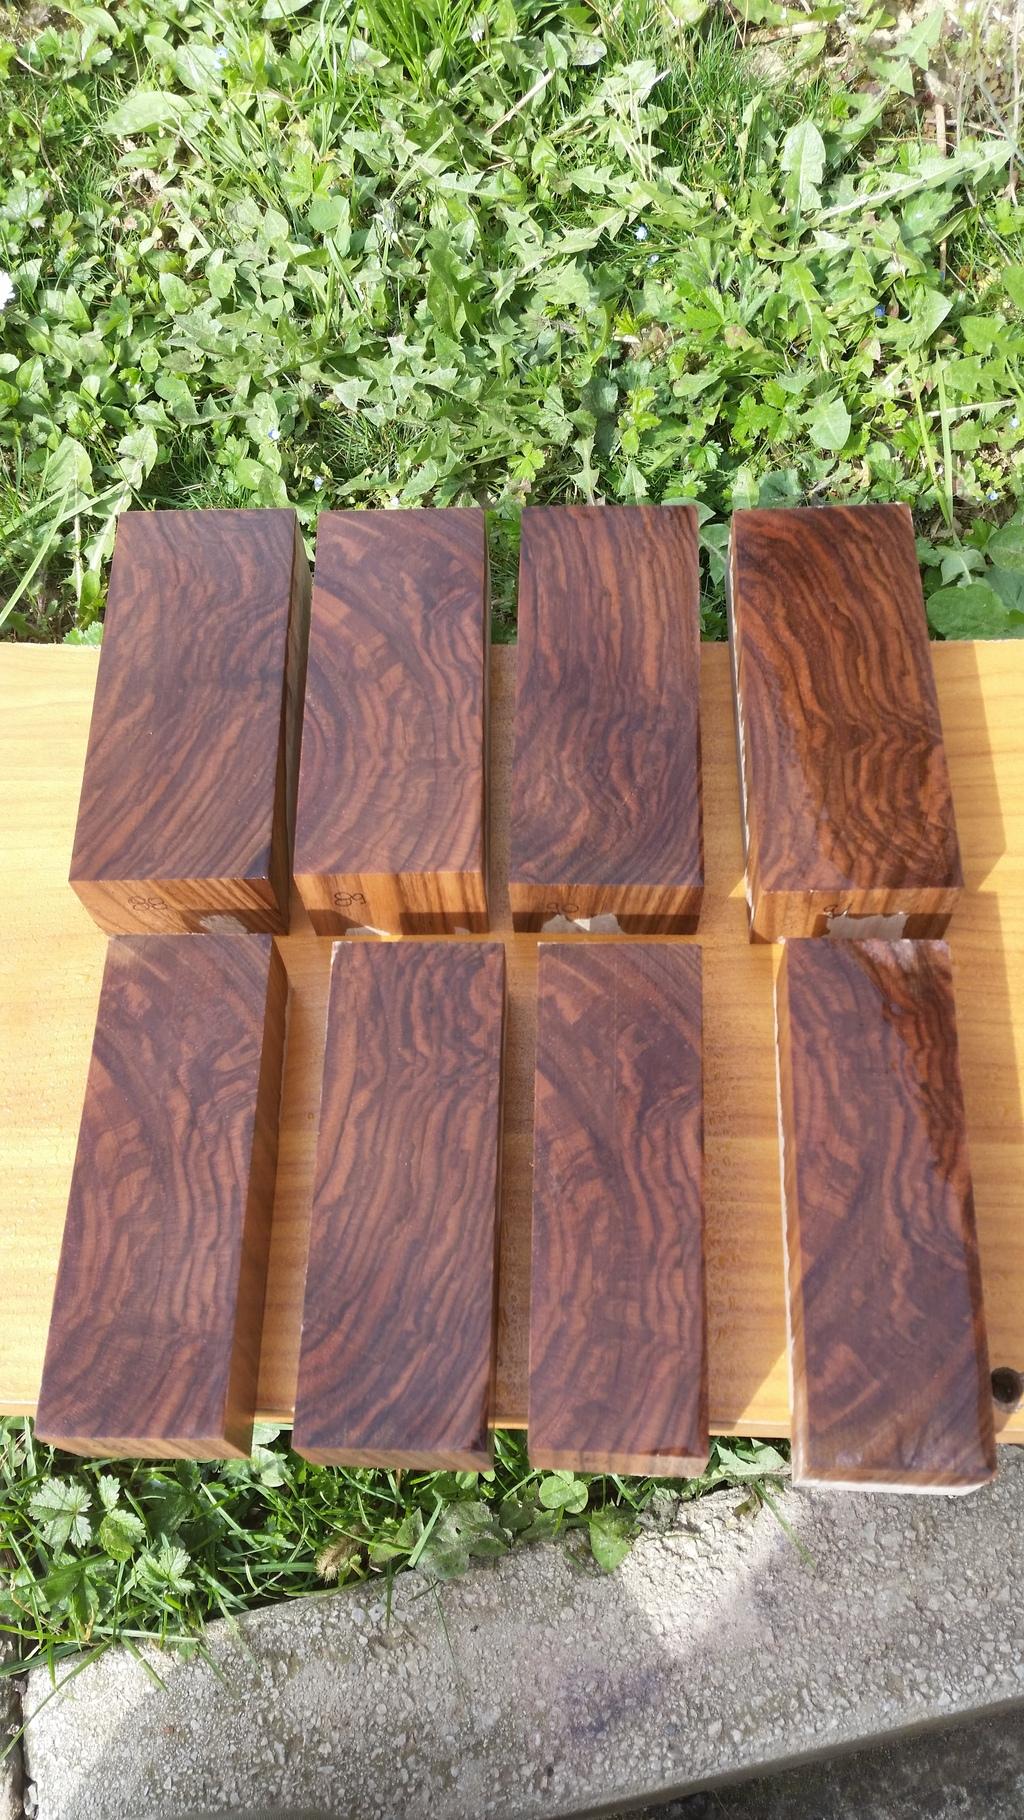 Stabilizacija drva - Page 6 20160403_104843_zpsju7dvqd1